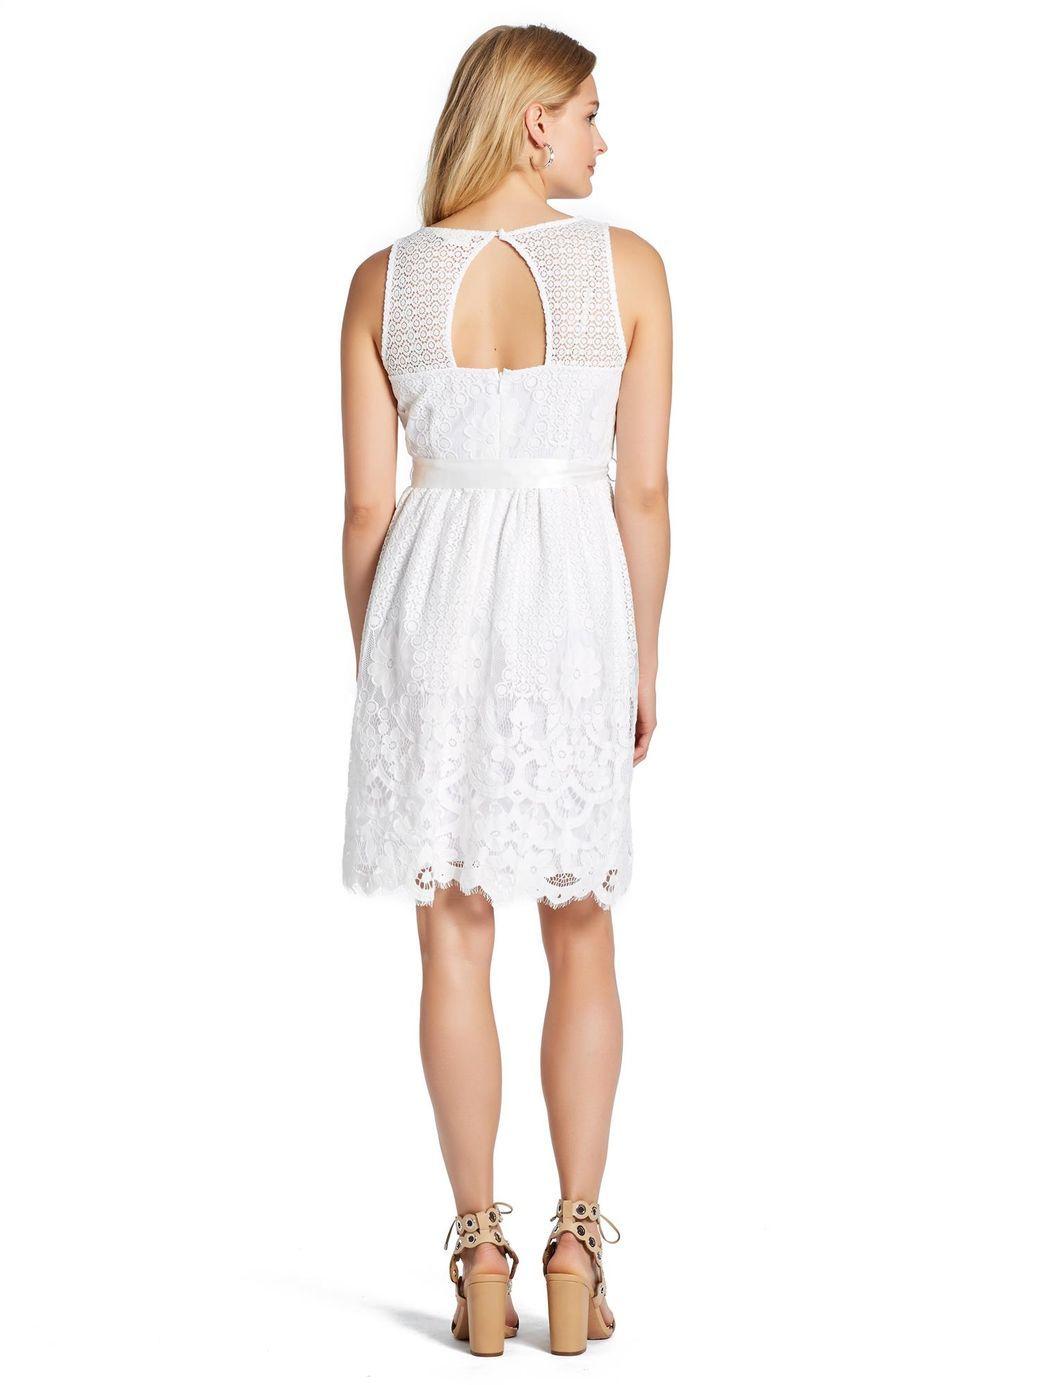 Jessica simpson lace maternity dress white ideas maternity jessica simpson lace maternity dress white ombrellifo Image collections